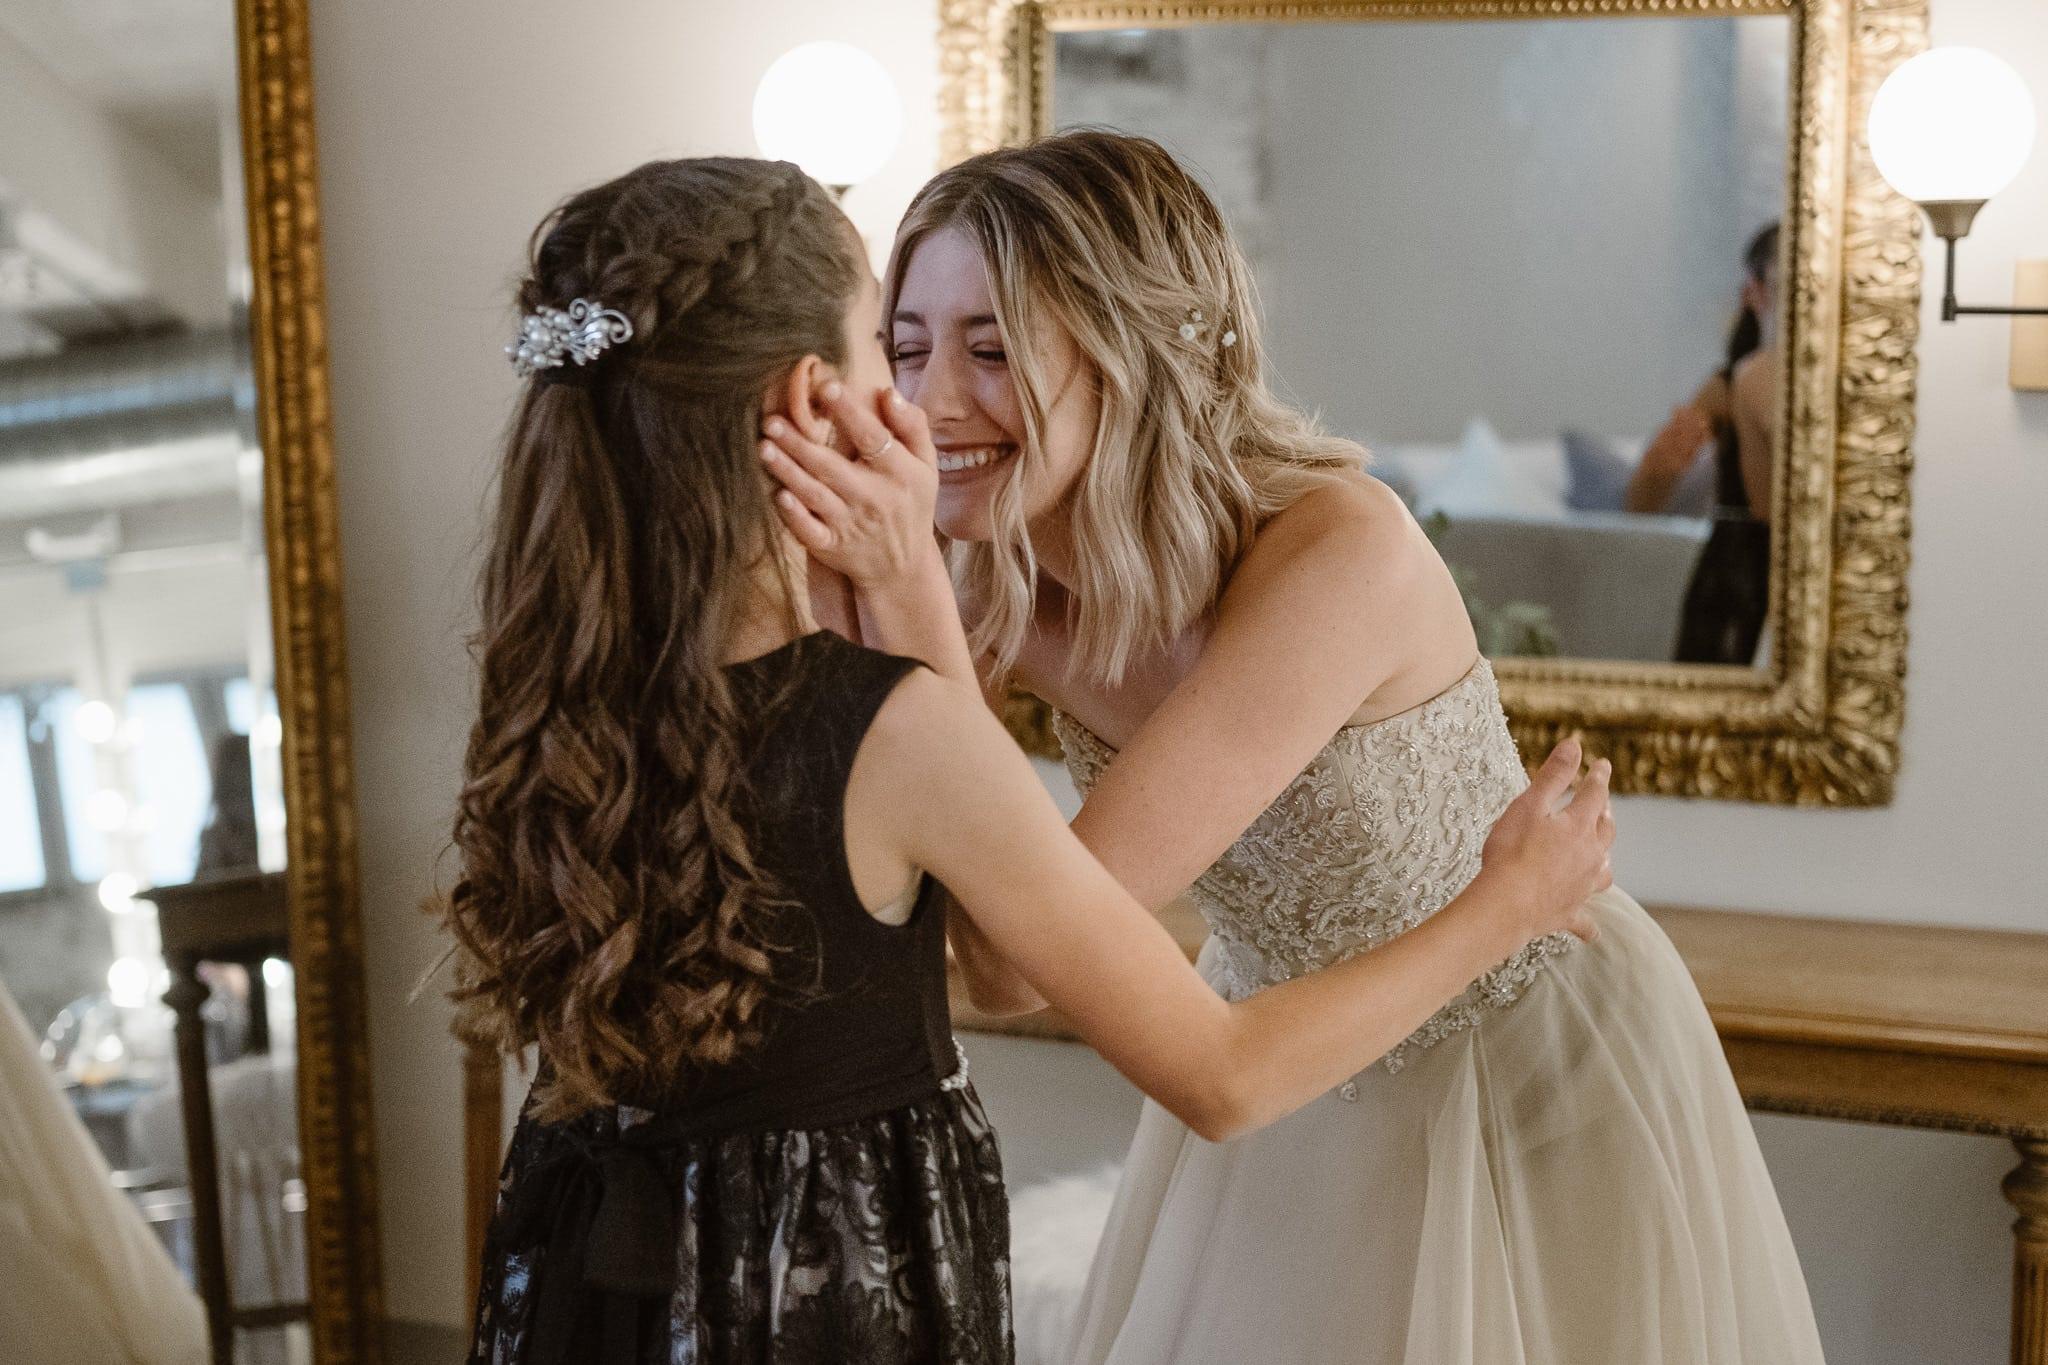 St Vrain Wedding Photographer | Longmont Wedding Photographer | Colorado Winter Wedding Photographer, Colorado industrial chic wedding, bride with her little sister